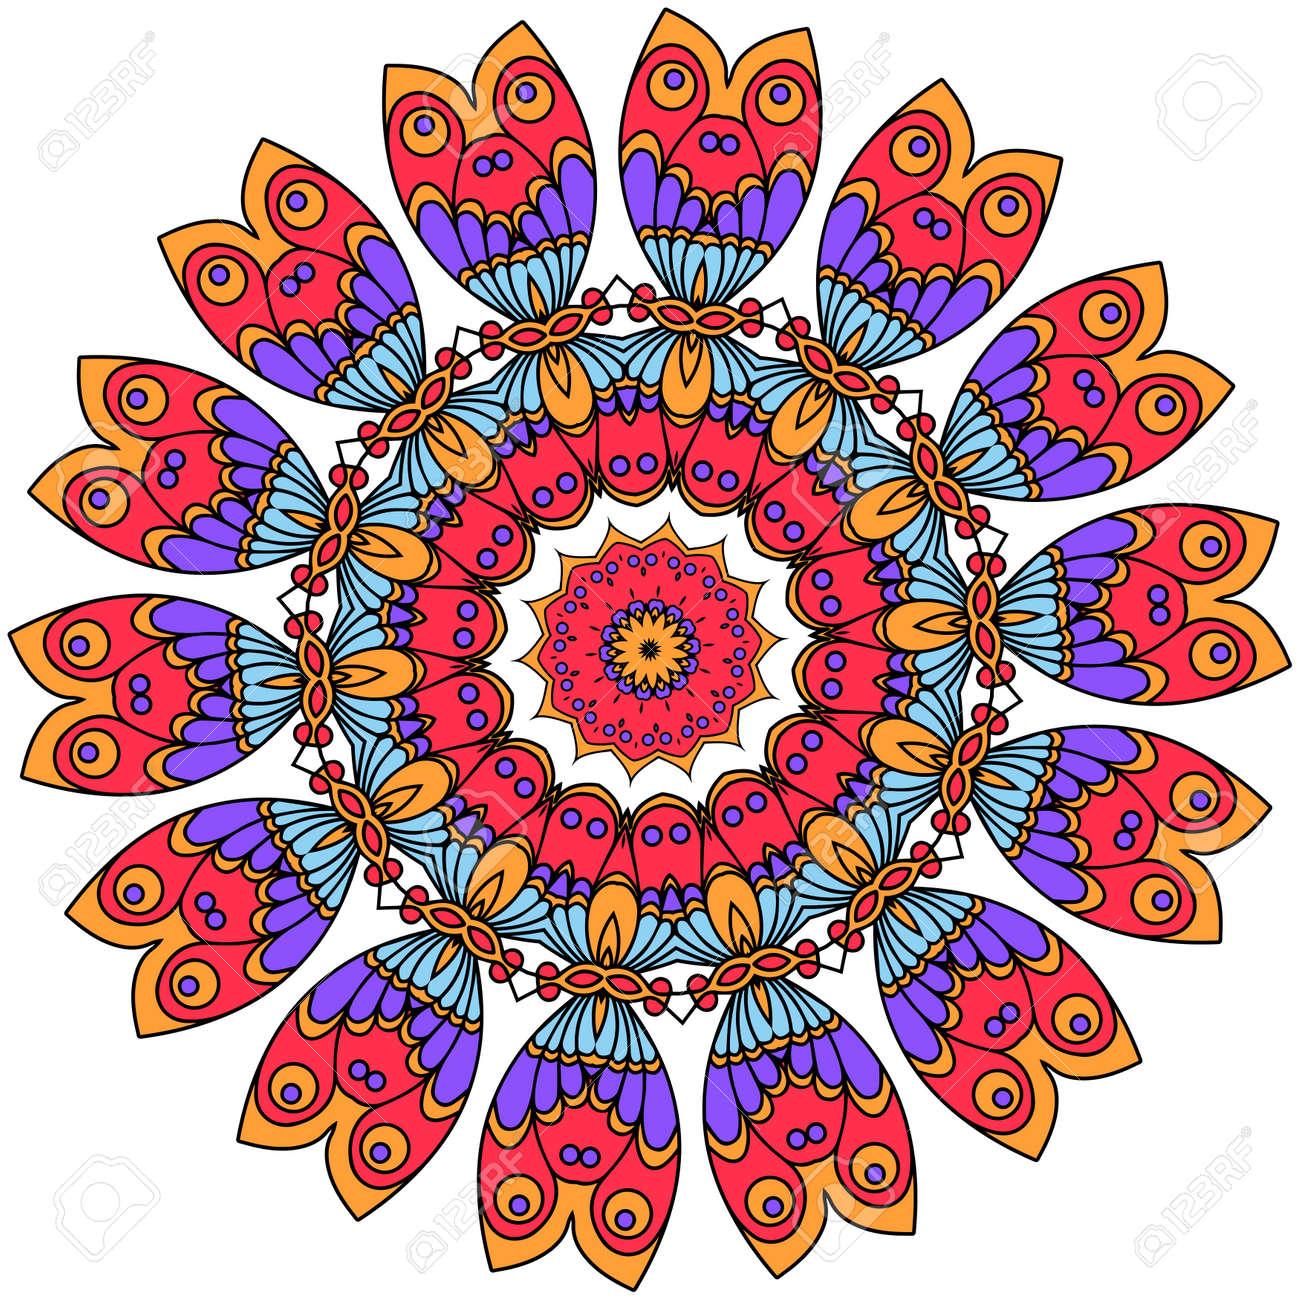 Mandalas. Vintage decorative elements. Oriental pattern illustration - 56426865